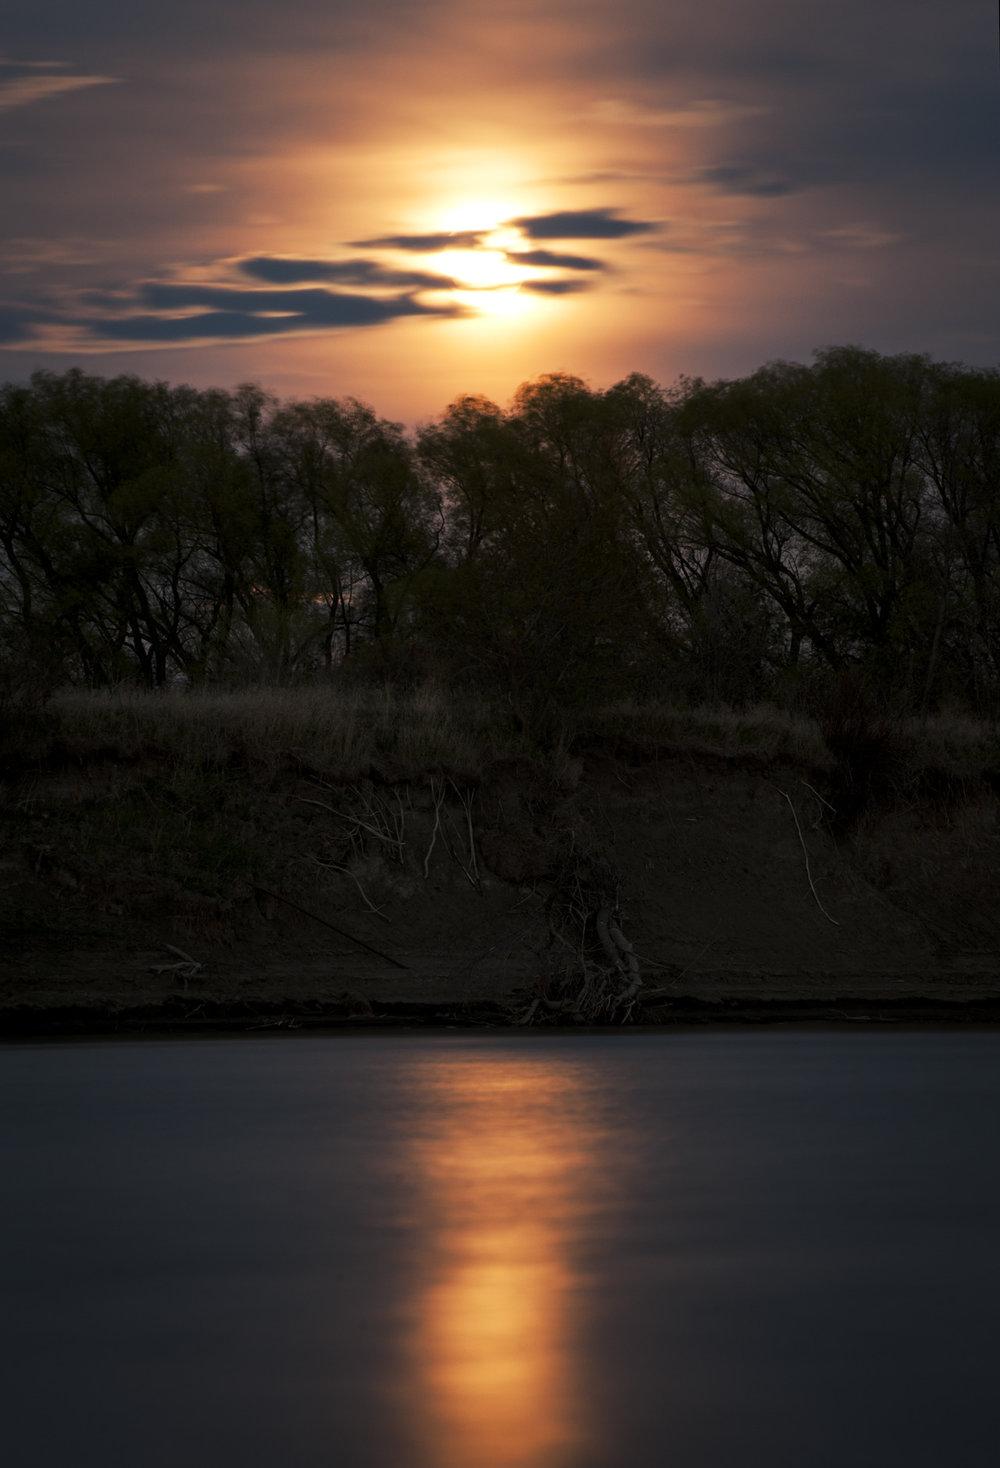 Moon     By: Robert Lowdon    Late at night the moon illuminates the landscape